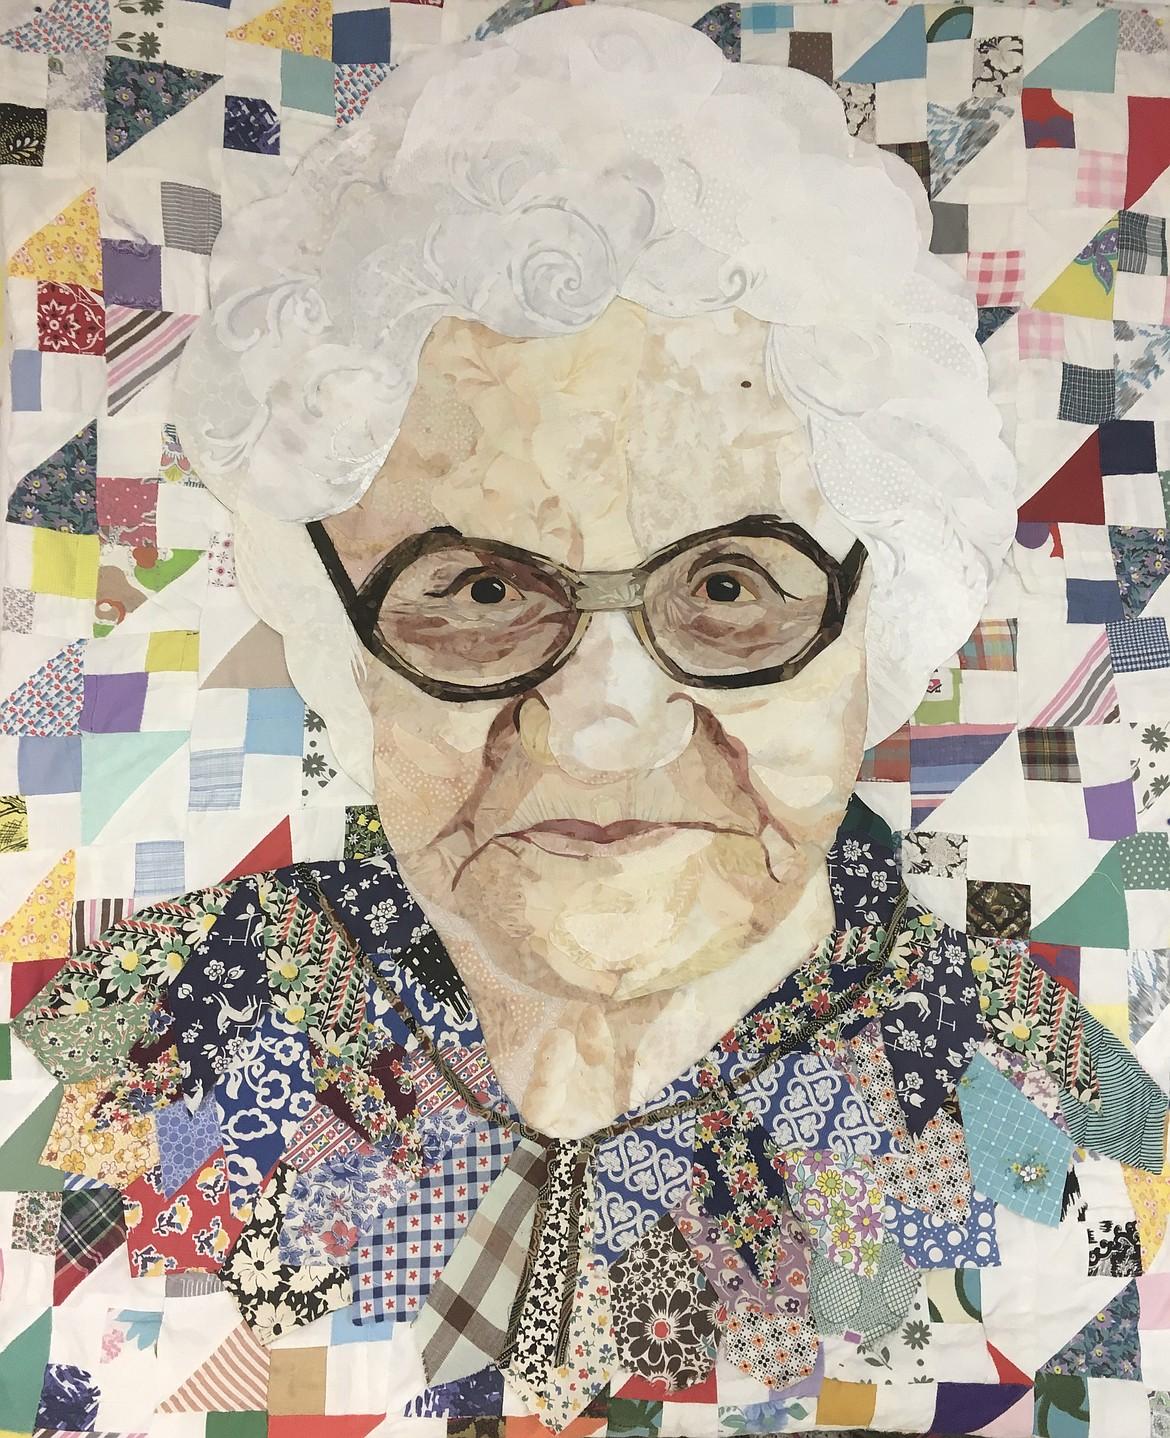 """Grandma Eslinger"" quilt by Lanette Cuffe"